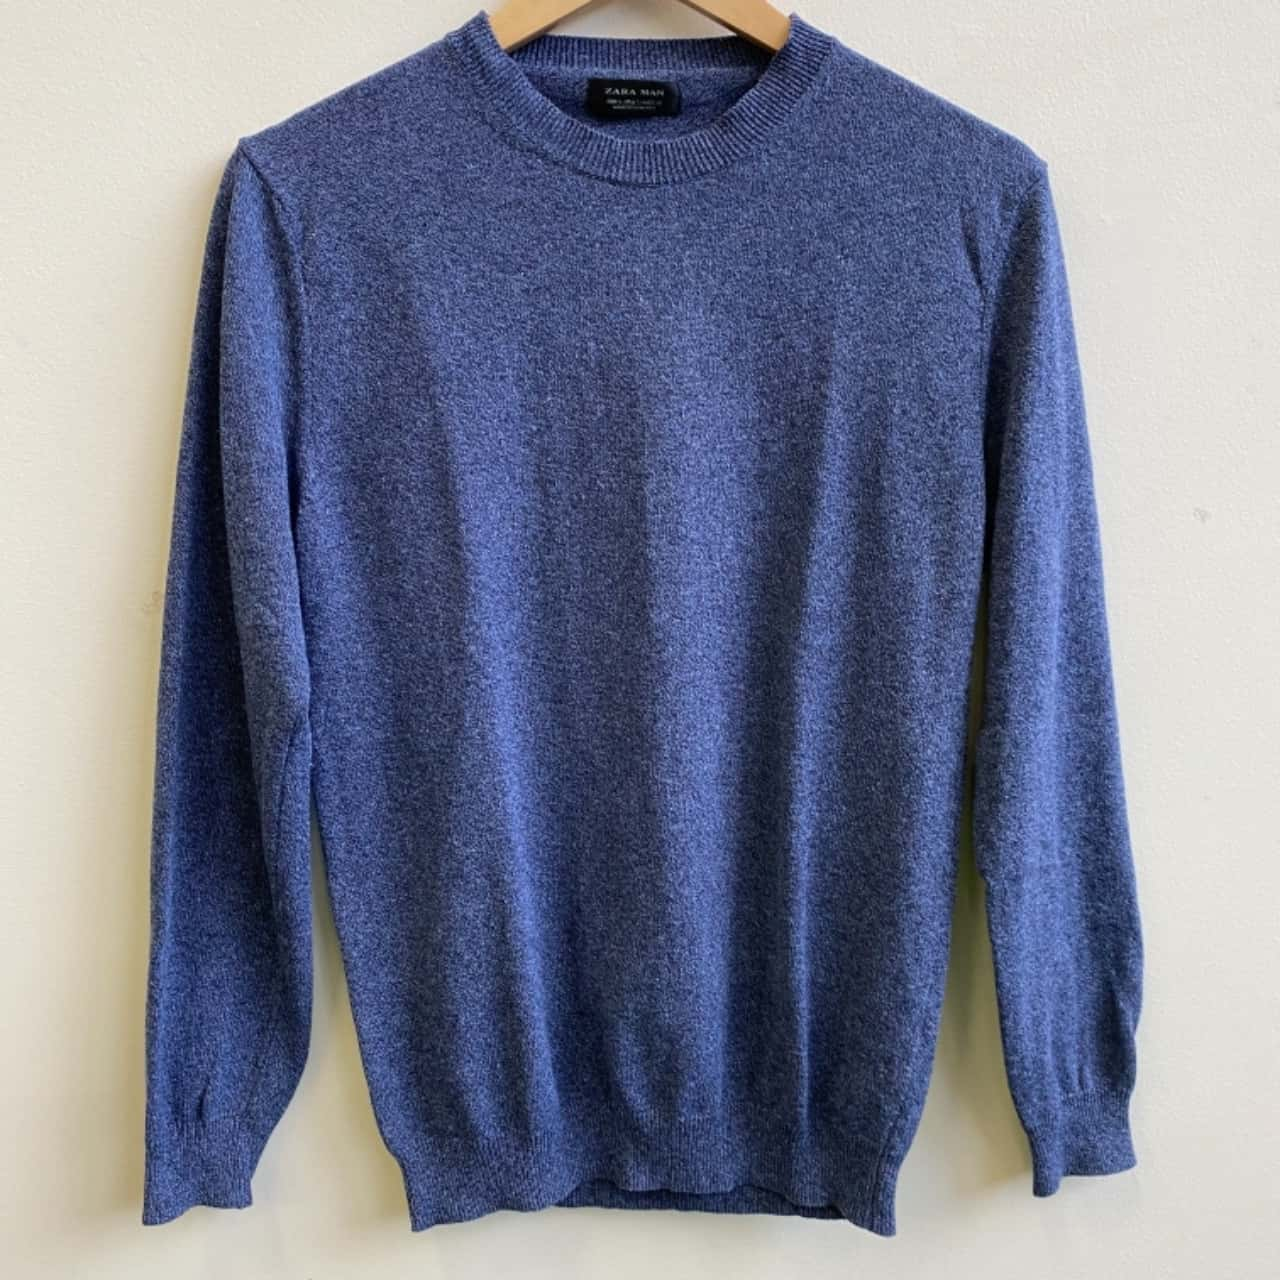 Zara Mens Basic Blue Knit Jumper Size S